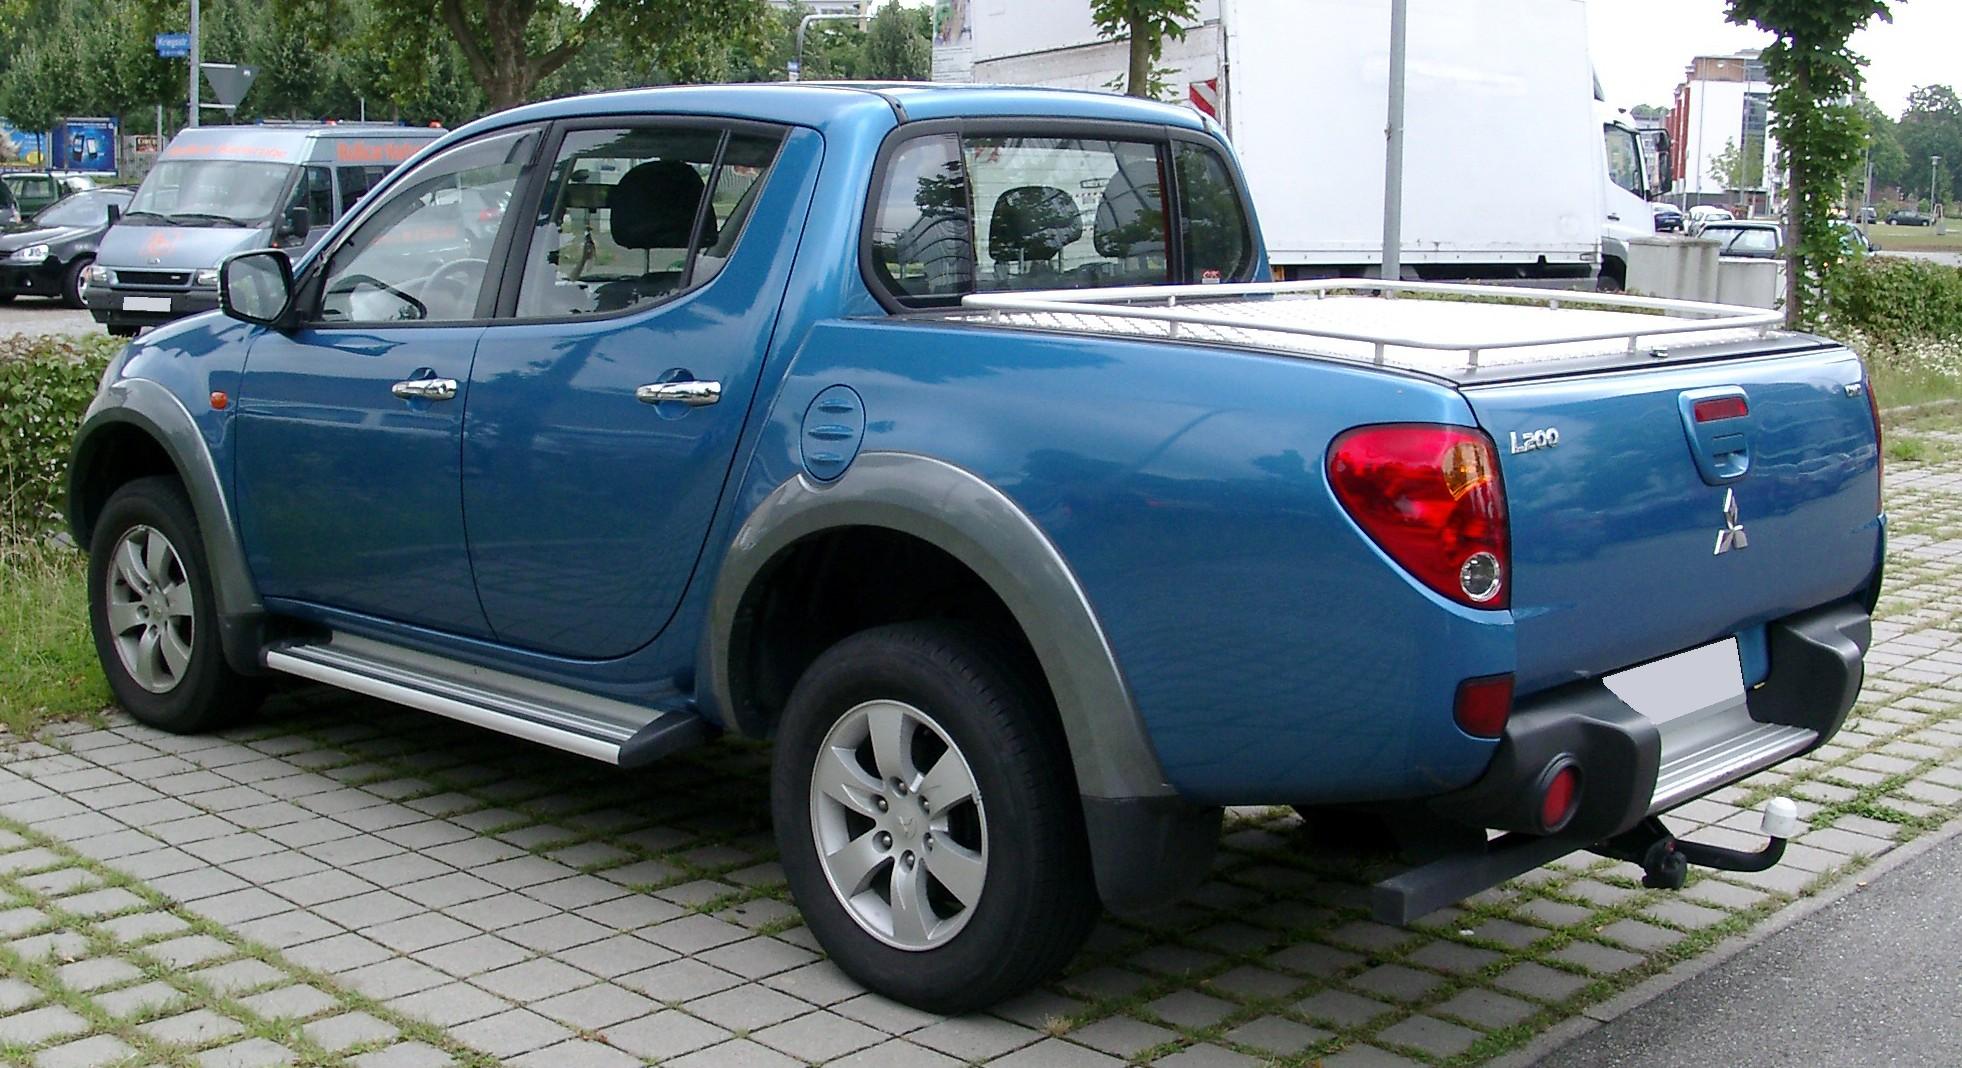 File:Mitsubishi L200 rear 20080722.jpg - Wikimedia Commons